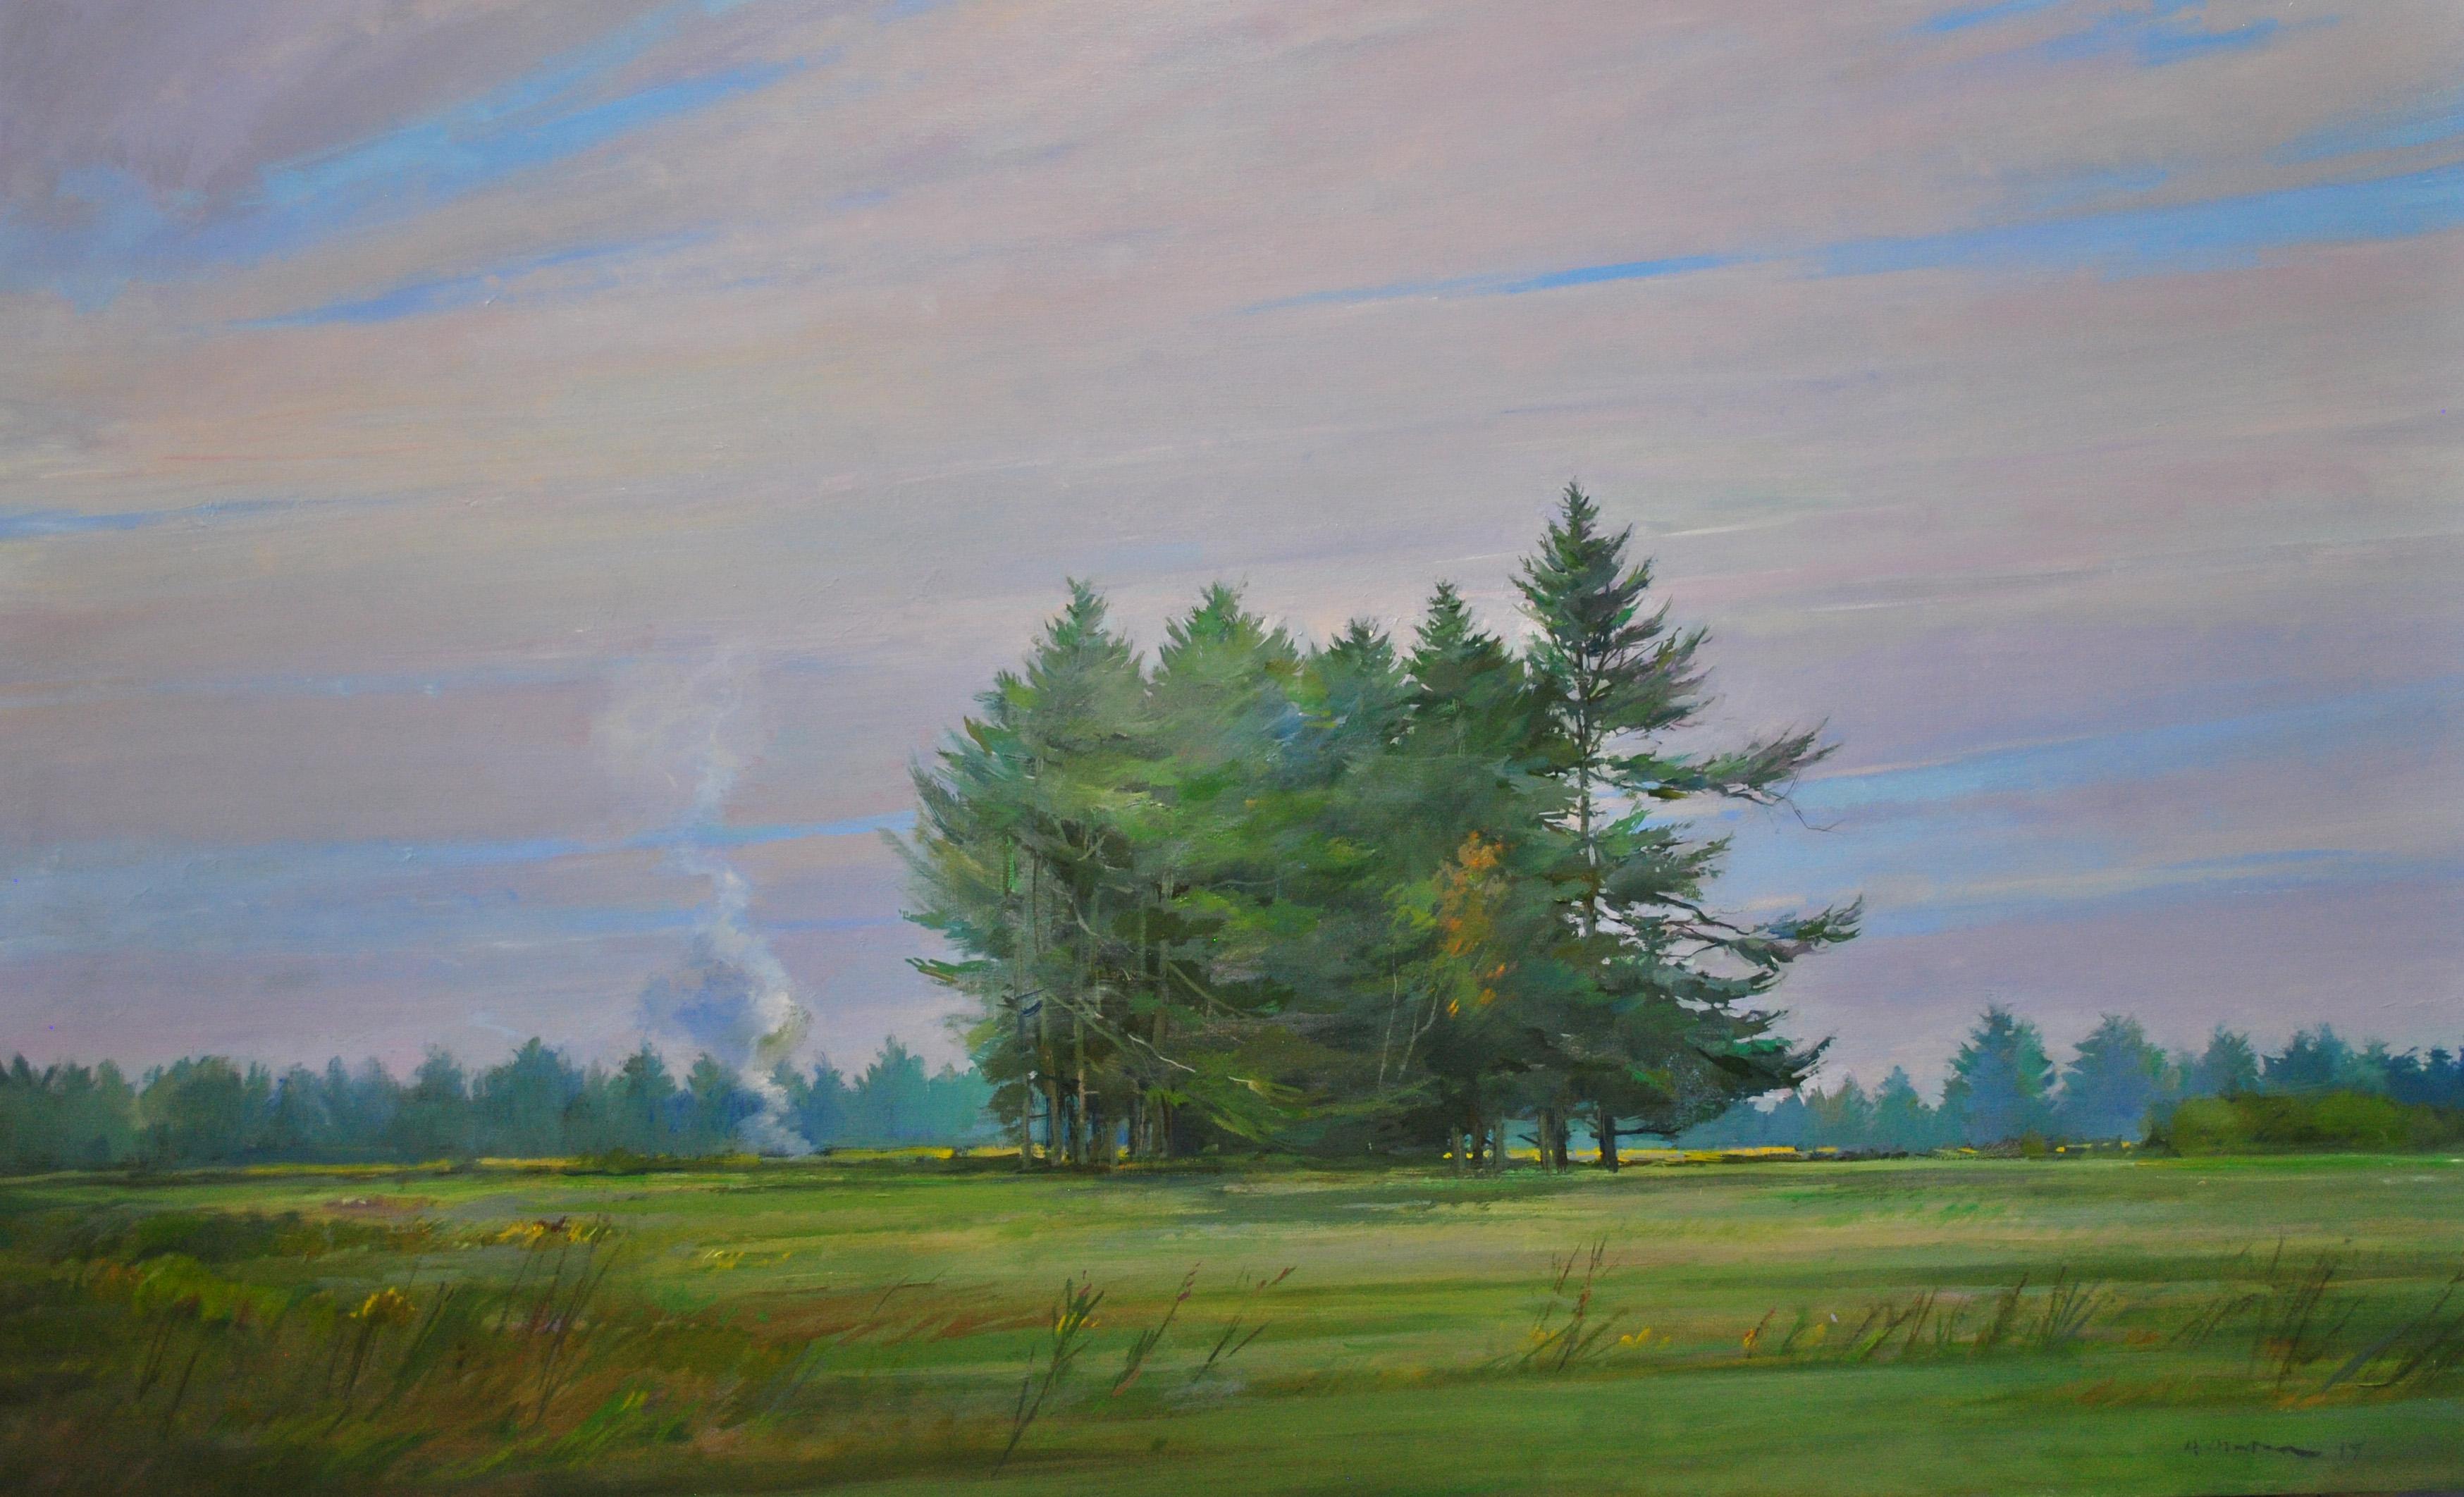 Pines in a Field